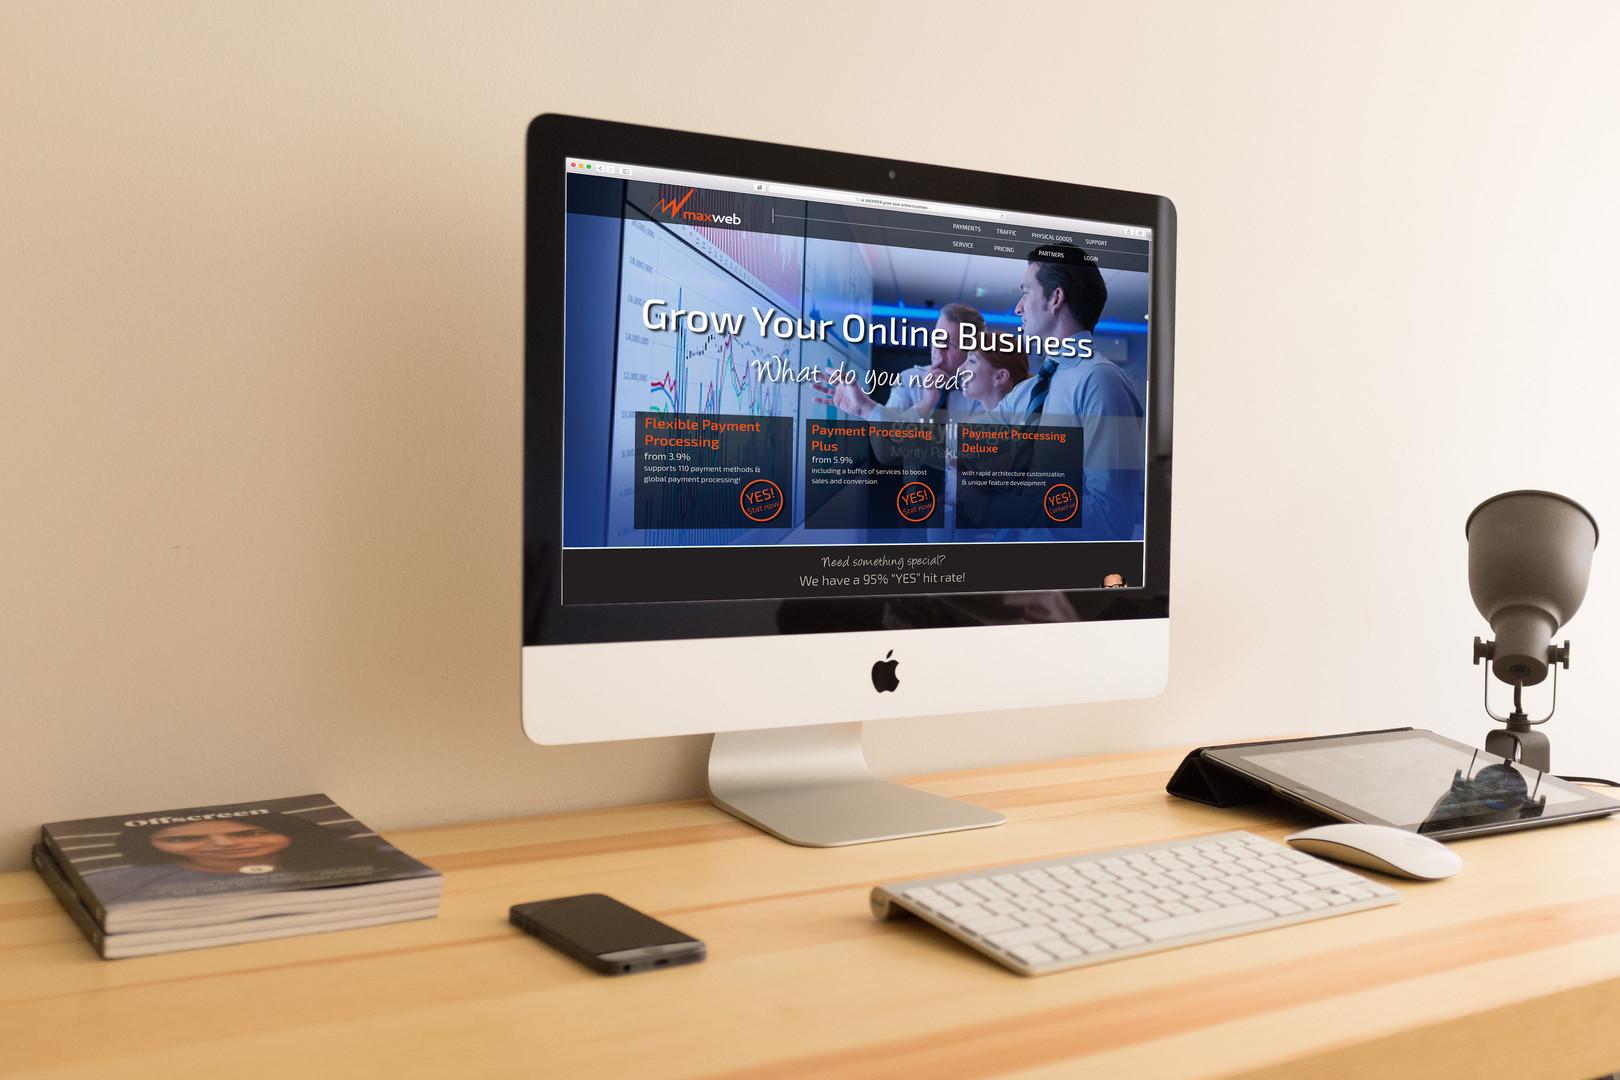 MAXWEB Web Design